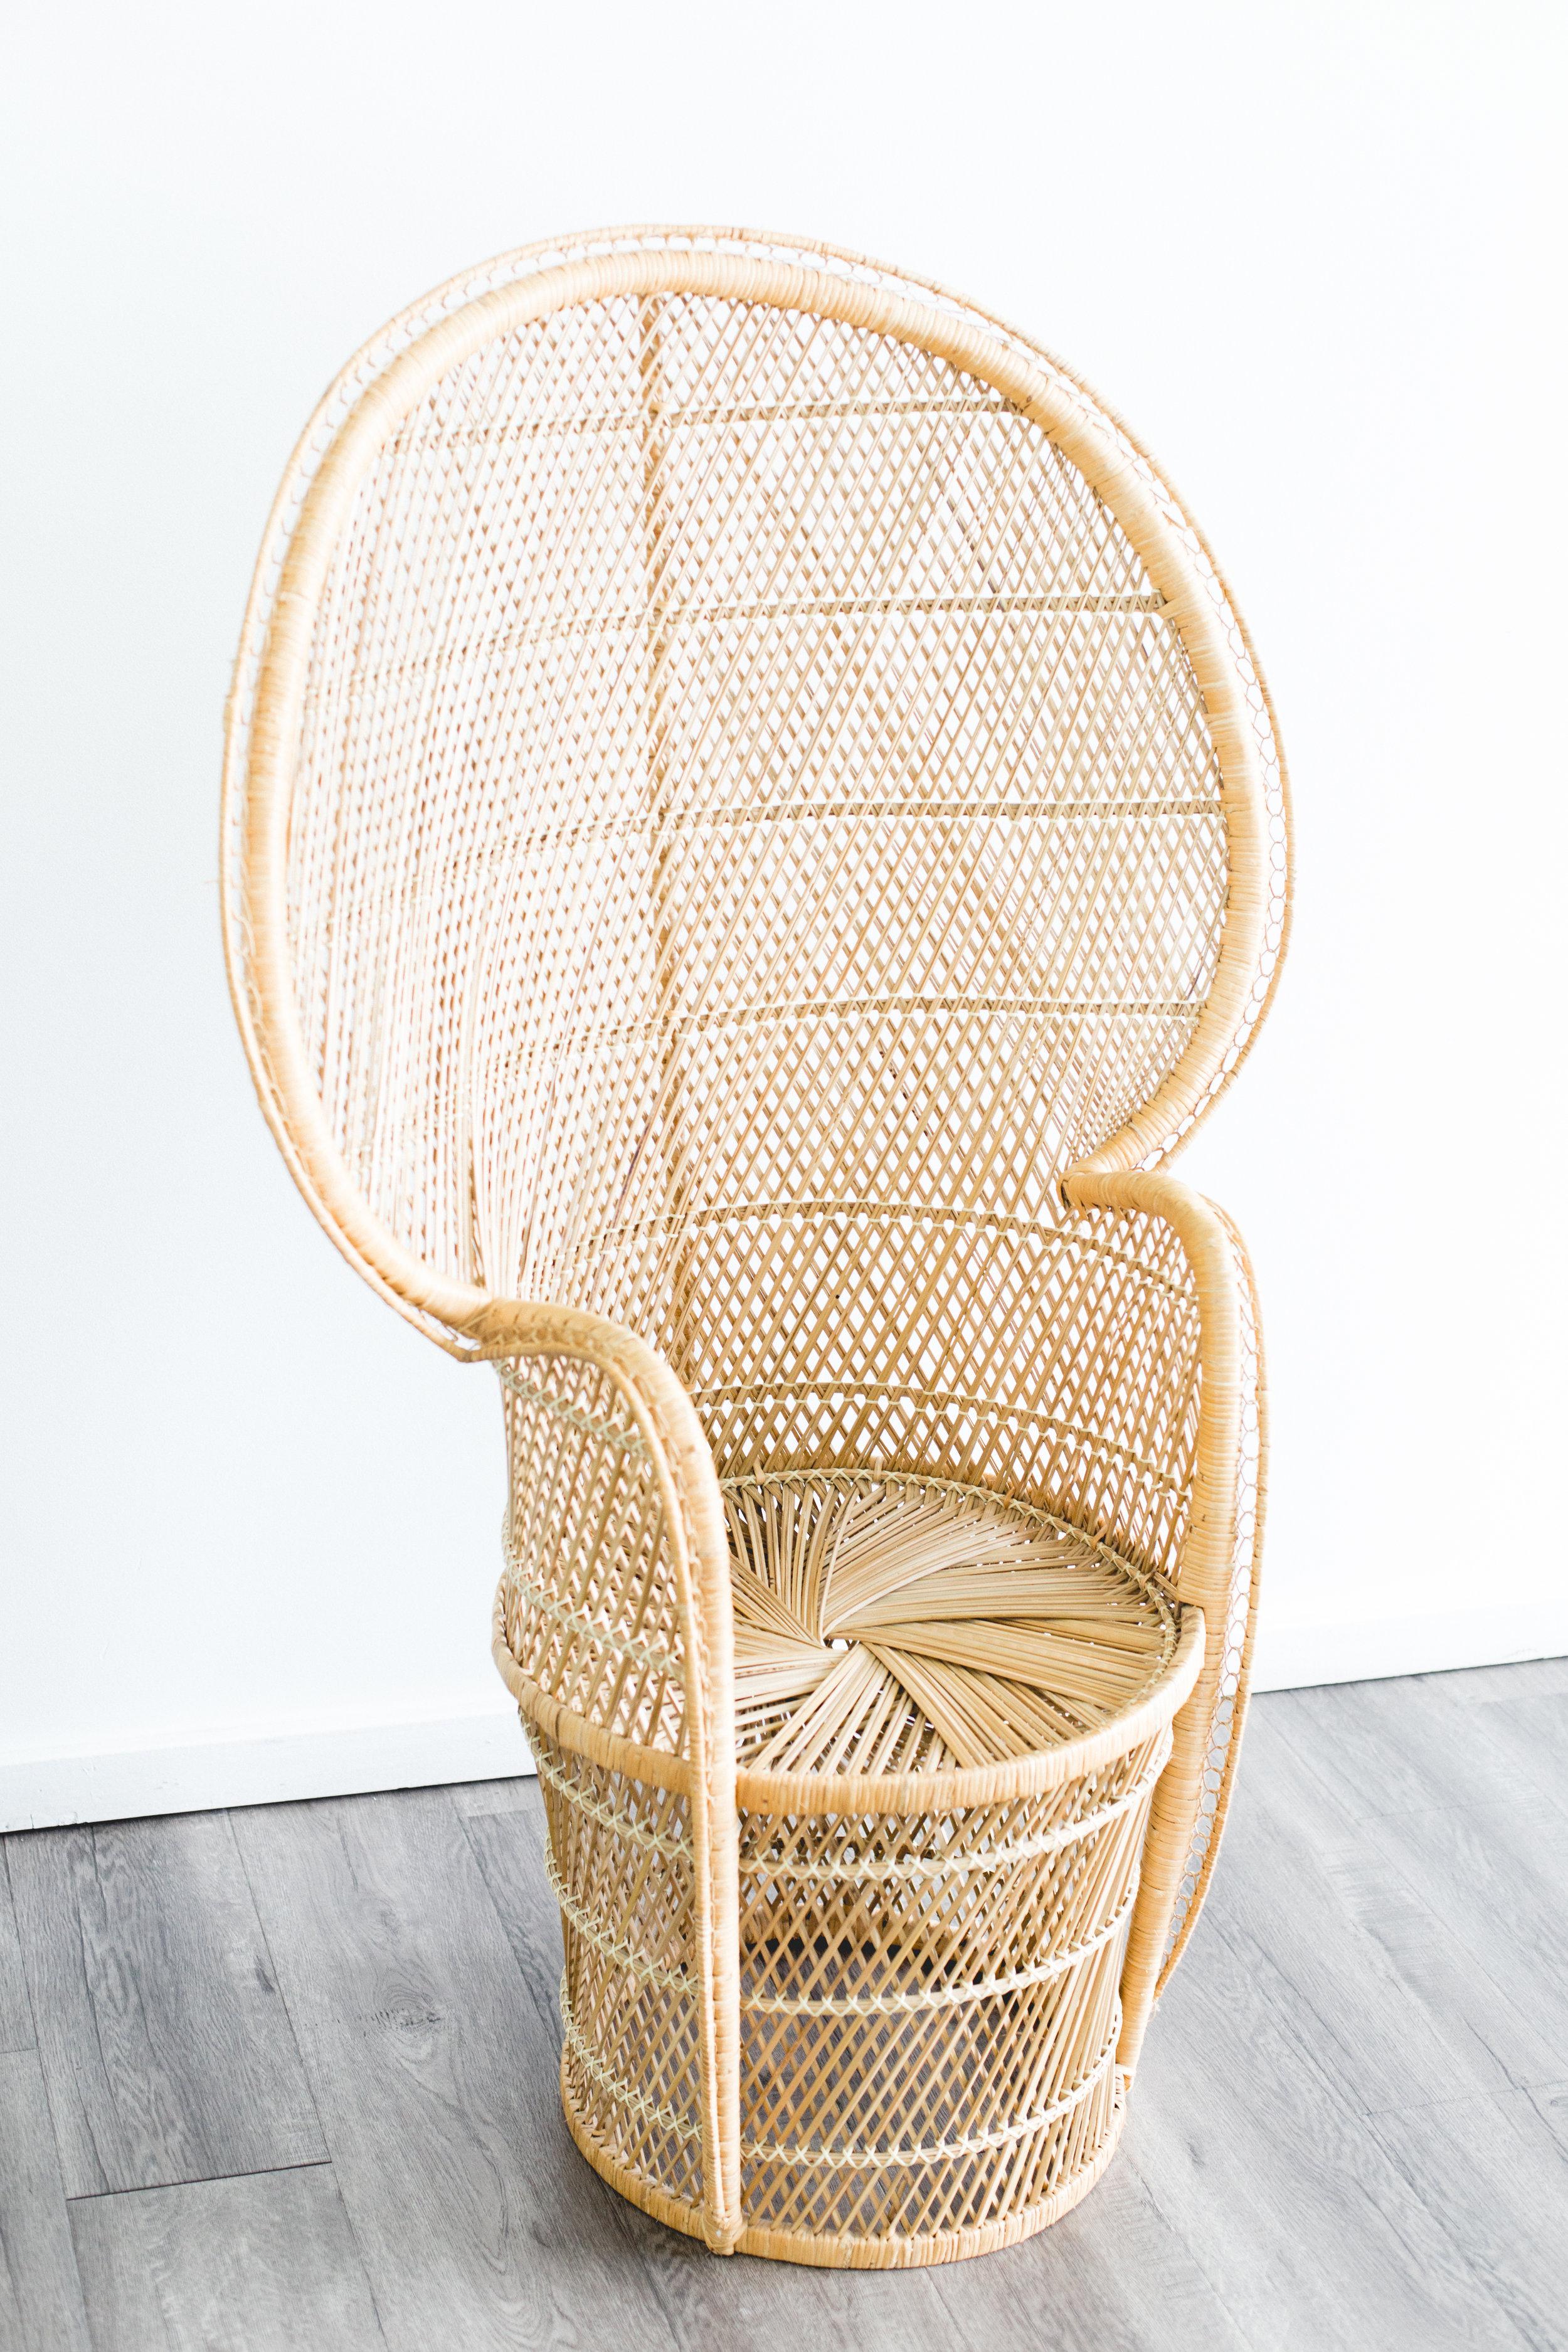 Vintage Rattan Peacock Chair Quantity: 2 Price: $100 EA